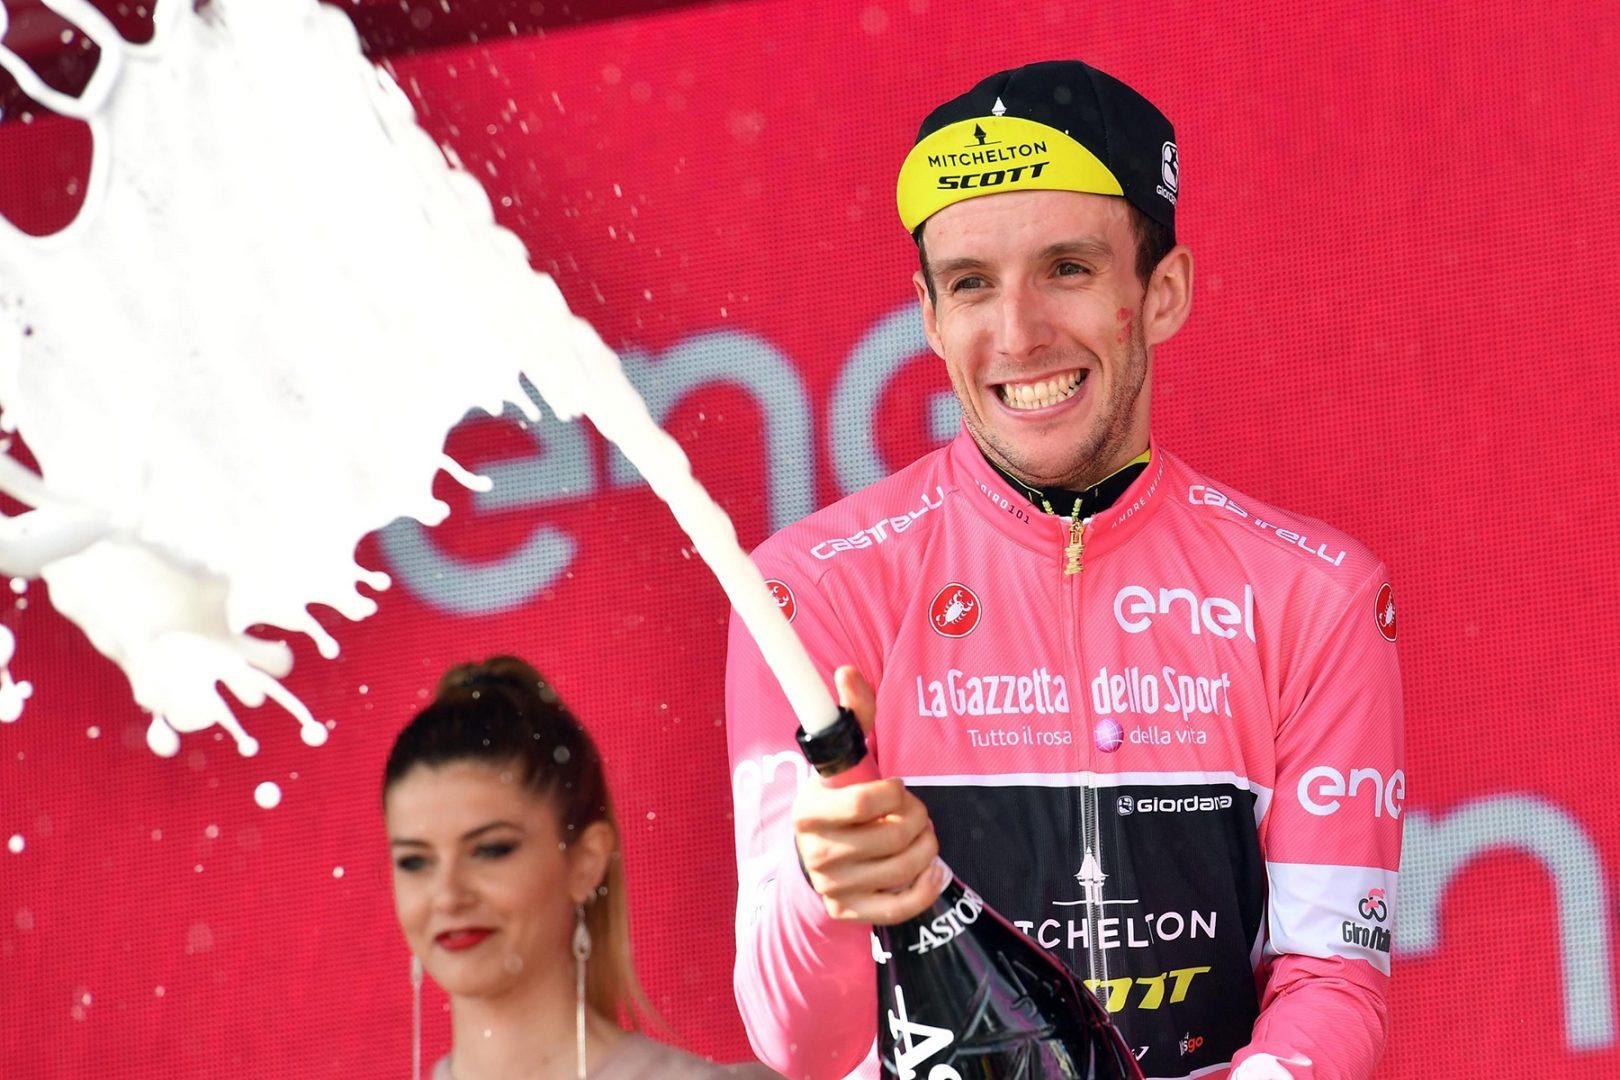 EPA104. ABBIATEGRASSO (ITALIA), 24/05/2018.- El ciclista británico Simon Yates del equipo Mitchelton-Scott, líder de la general, retiene el maillot rosa tras la 18º etapa del Giro de Italia de 196 kilómetros, entre Abbiategrasso y Prato Nevoso, en Italia, hoy, 24 de mayo de 2018. EFE/ Daniel Dal Zennaro